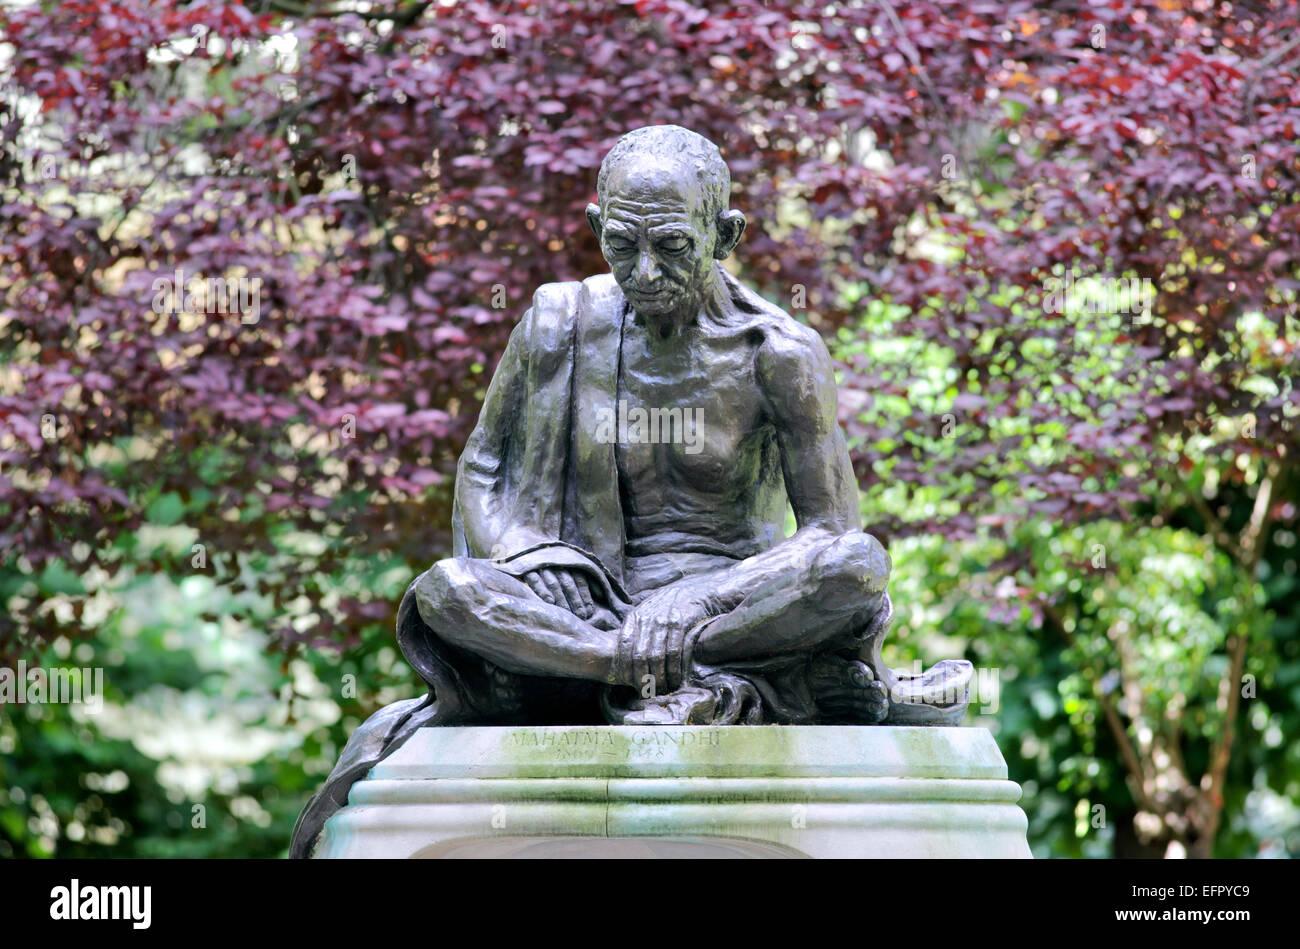 Statue of Mahatma Gandhi, Tavistock Square, London. - Stock Image